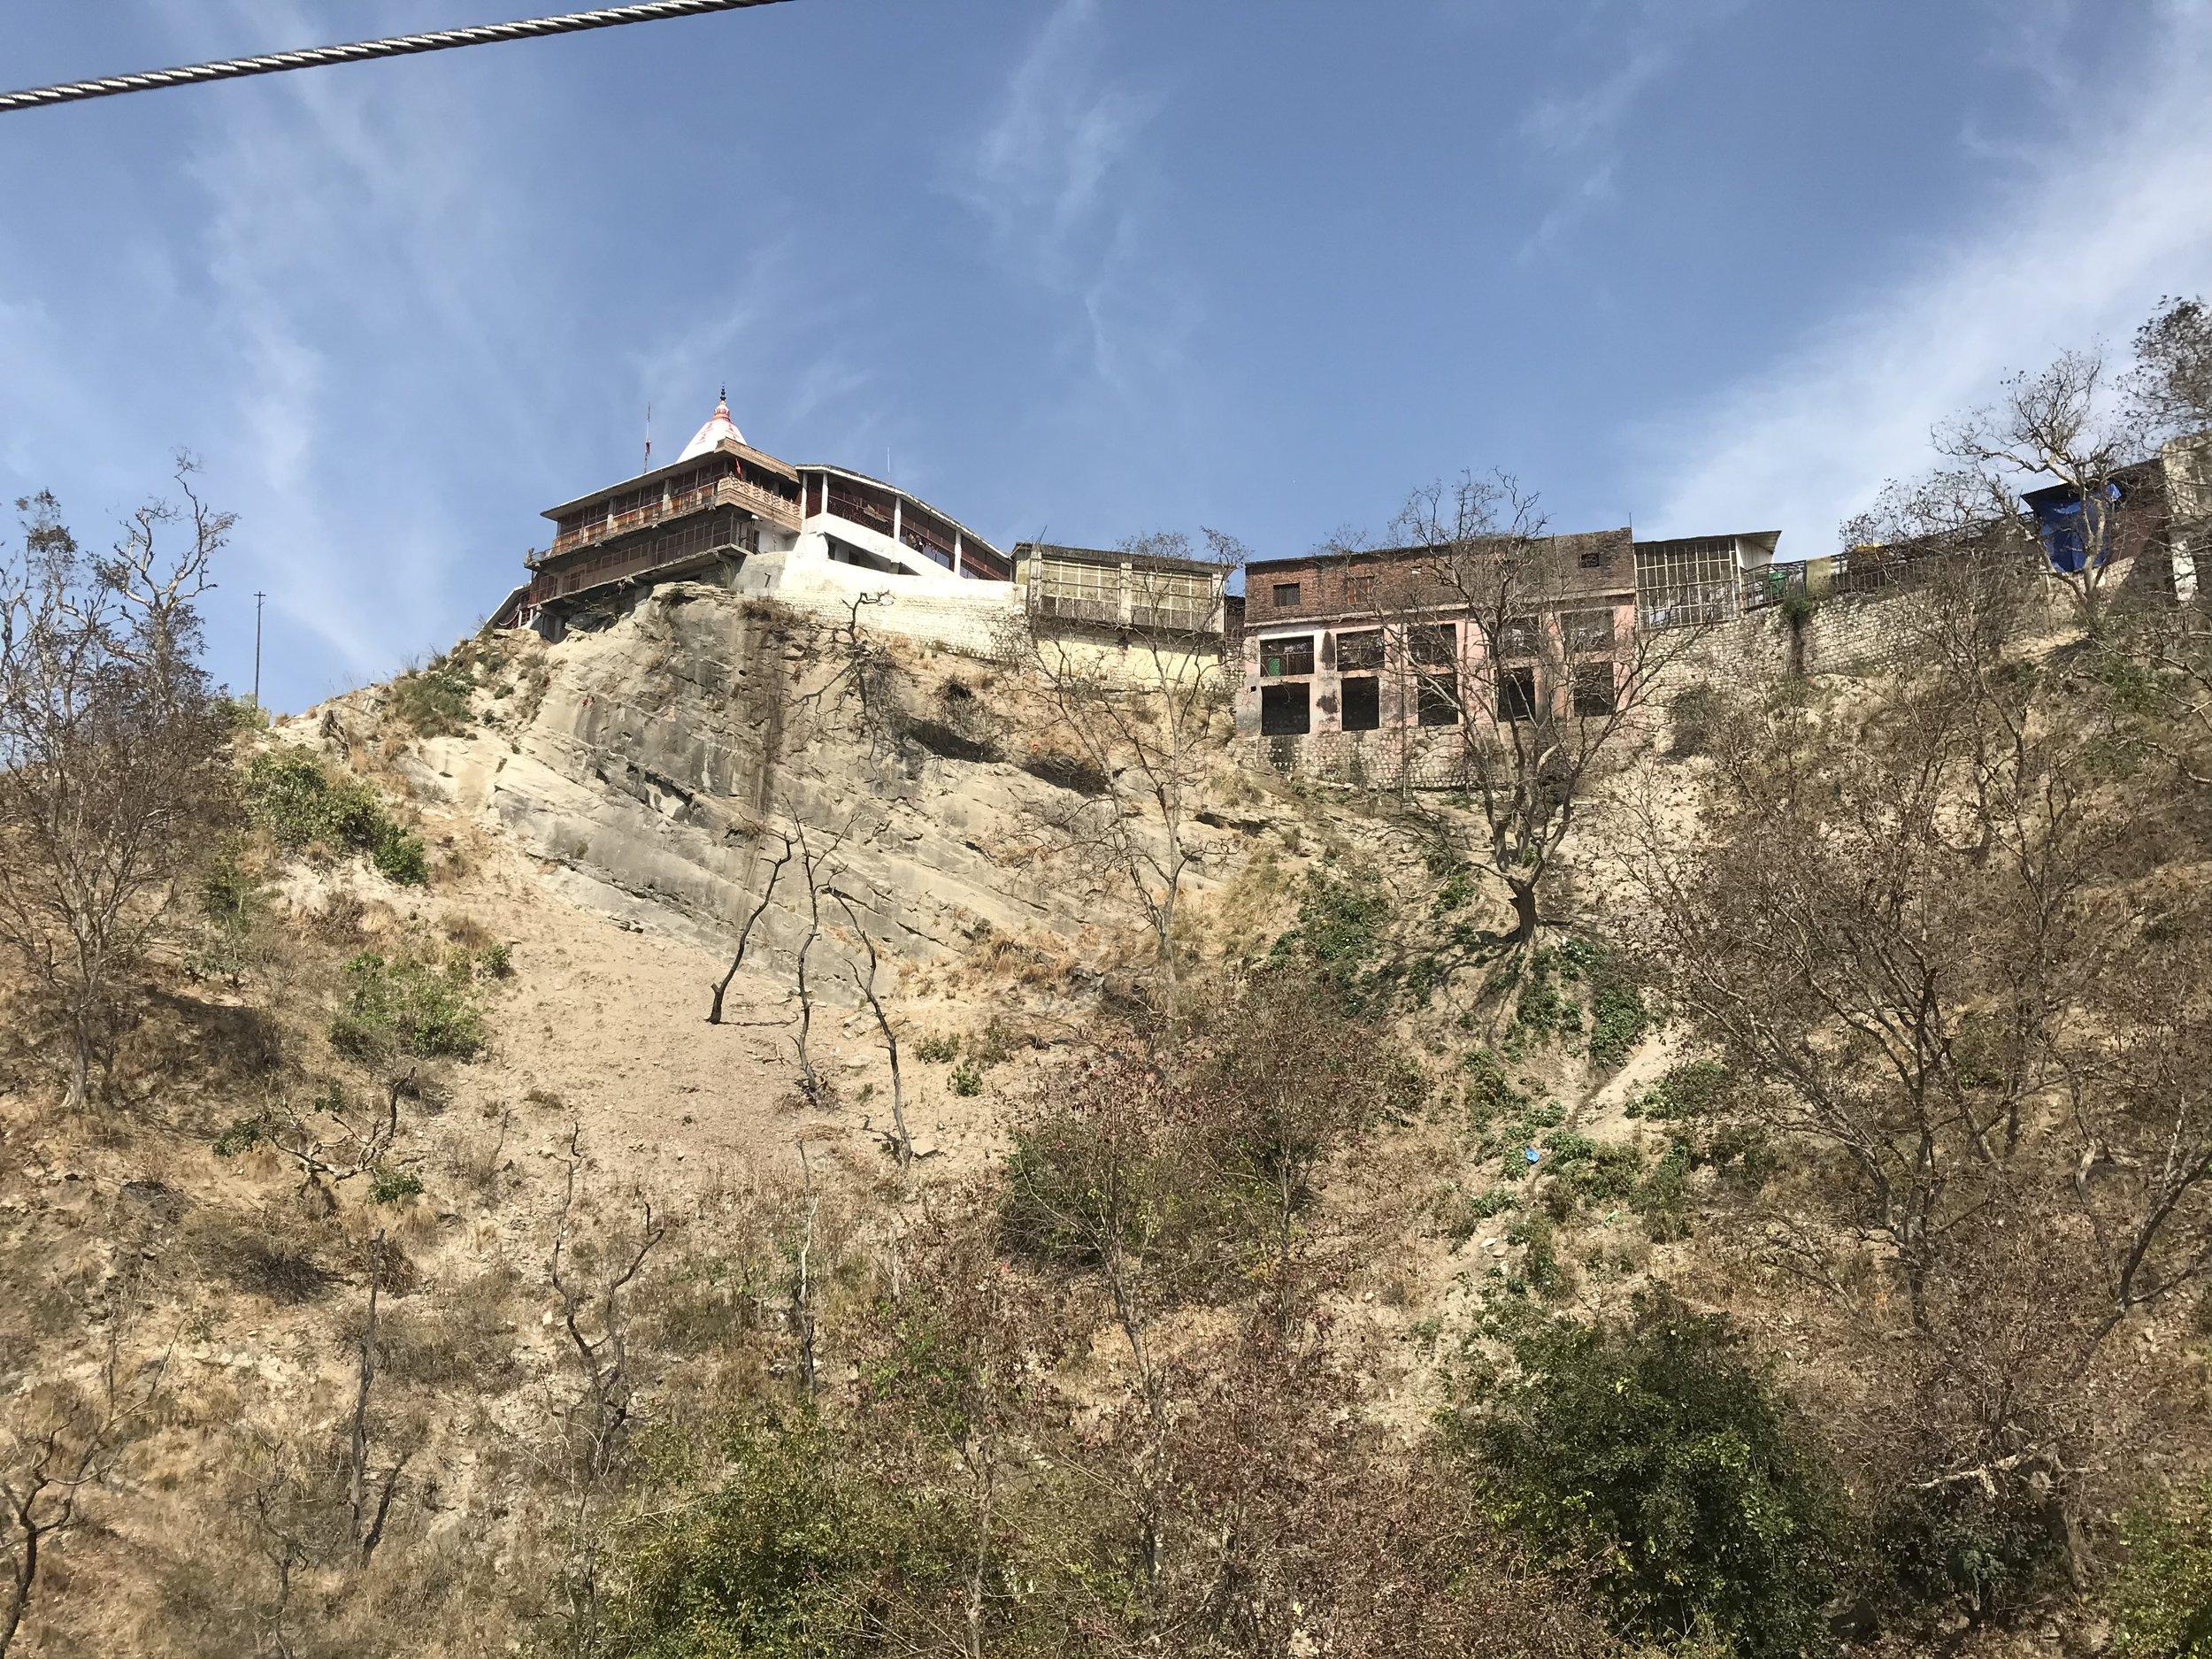 Chandi temple